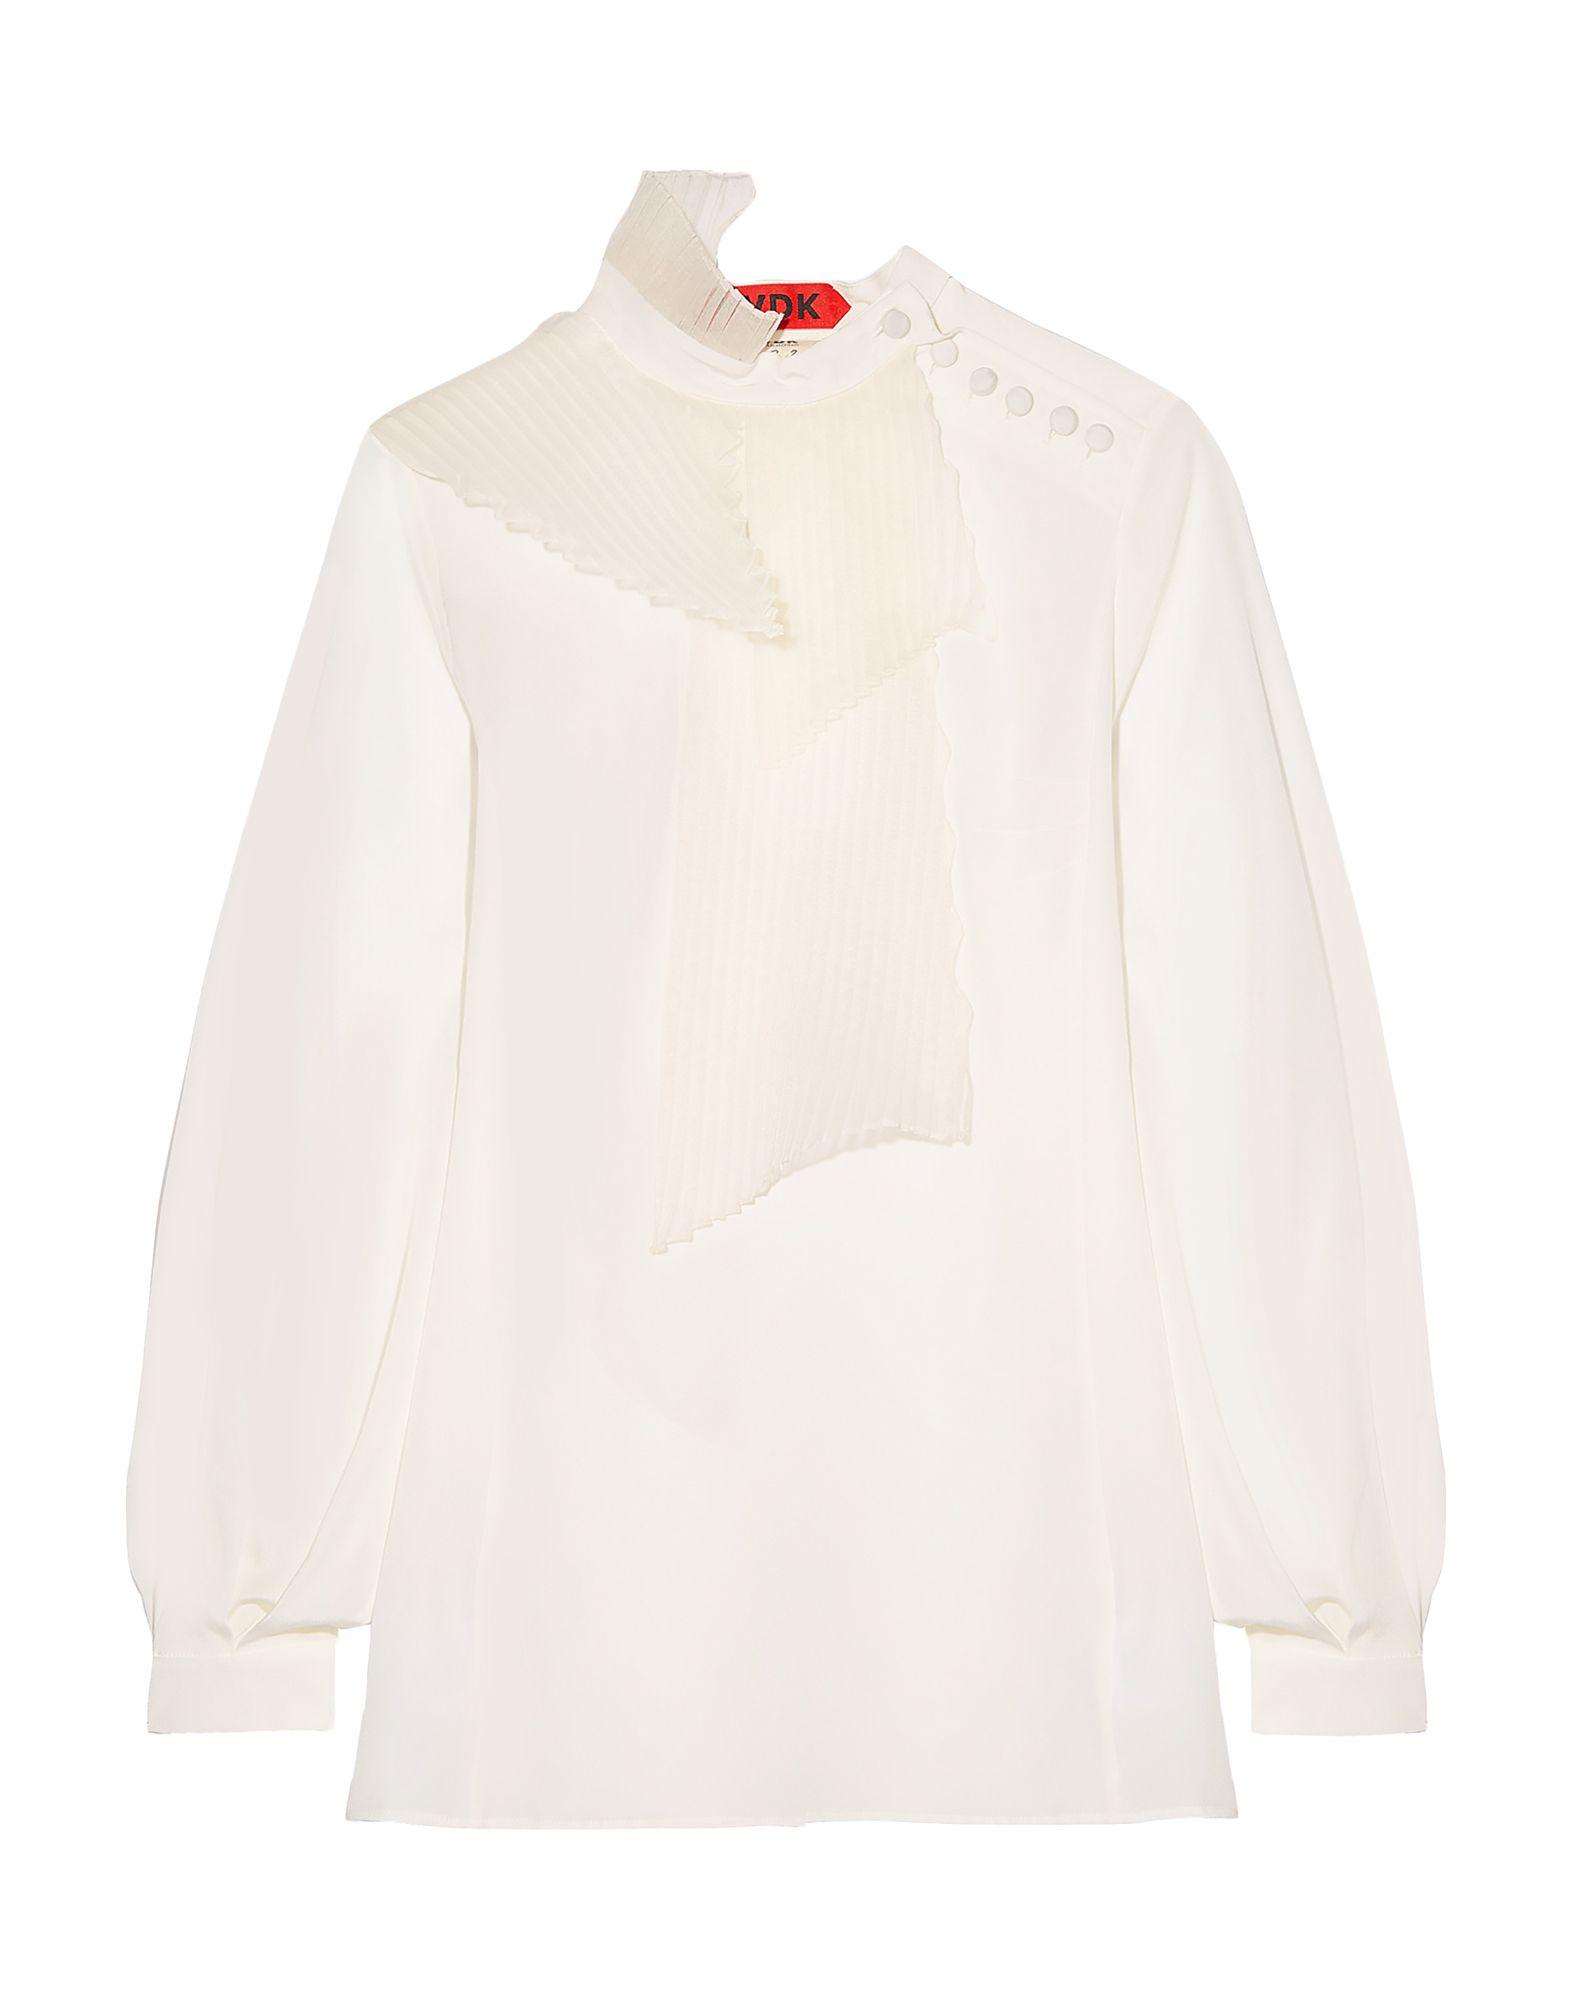 RONALD VAN DER KEMP Блузка michael van der ham блузка